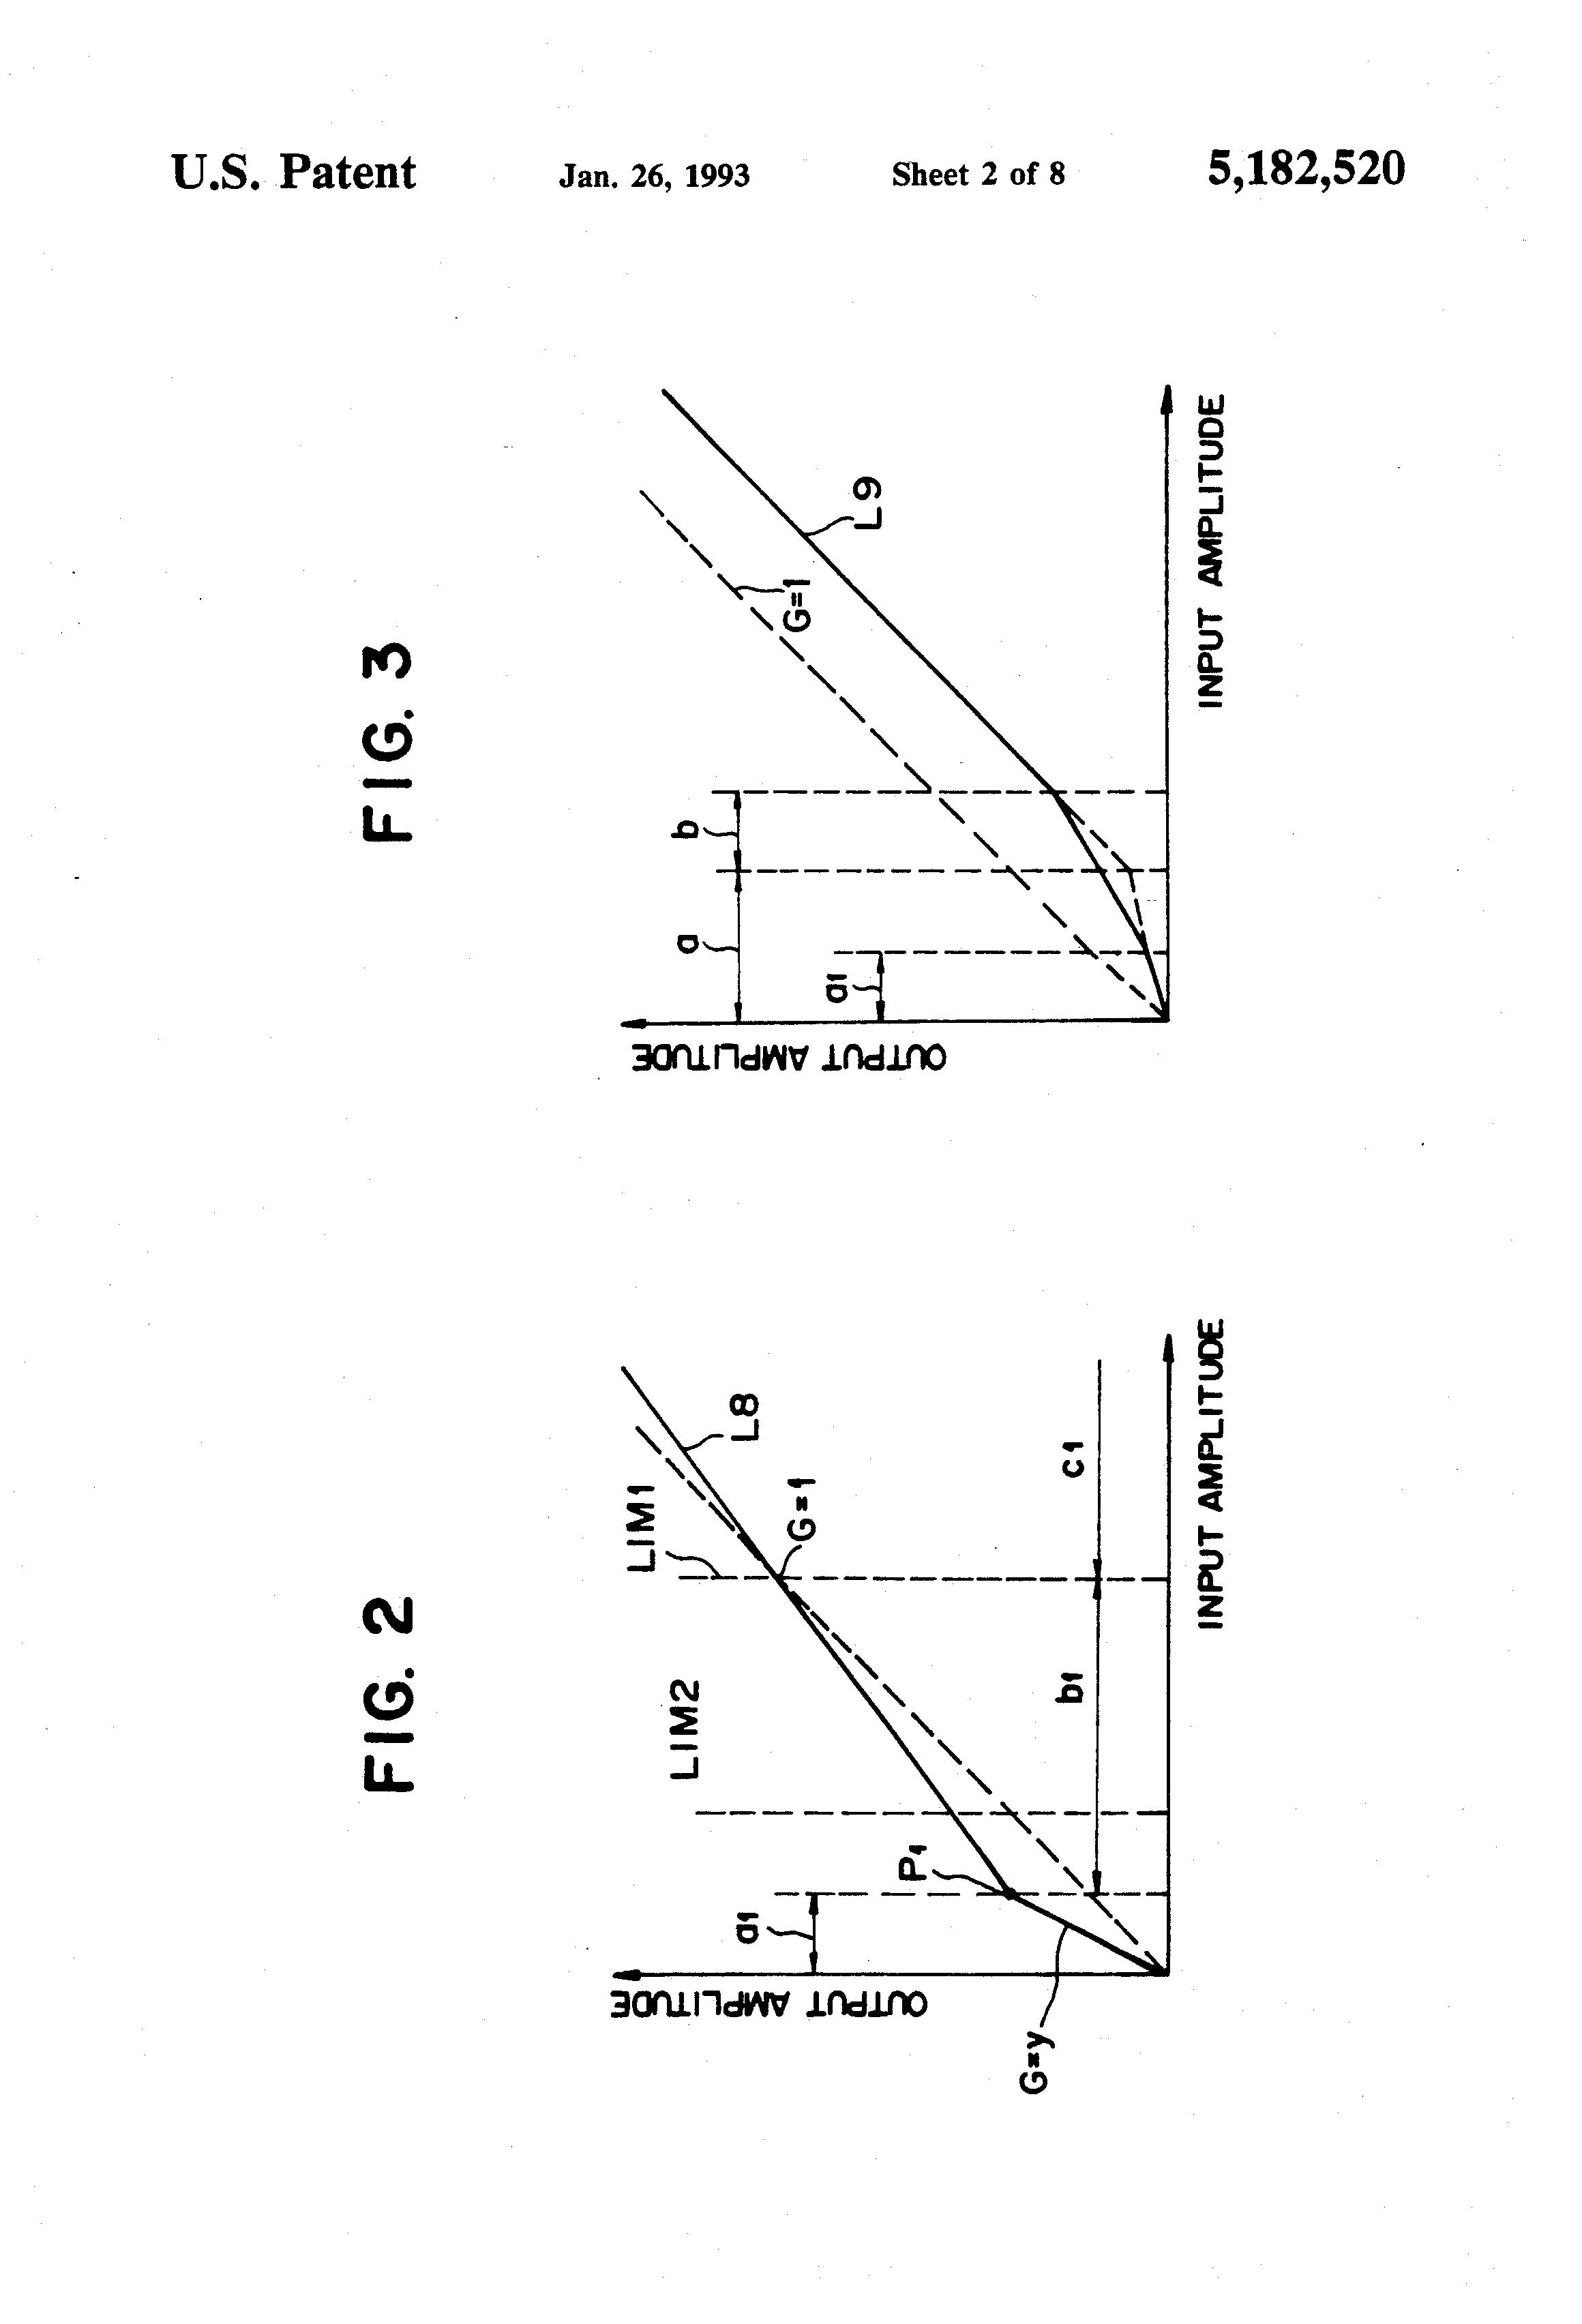 fig7 preemphasis and deemphasis circuit